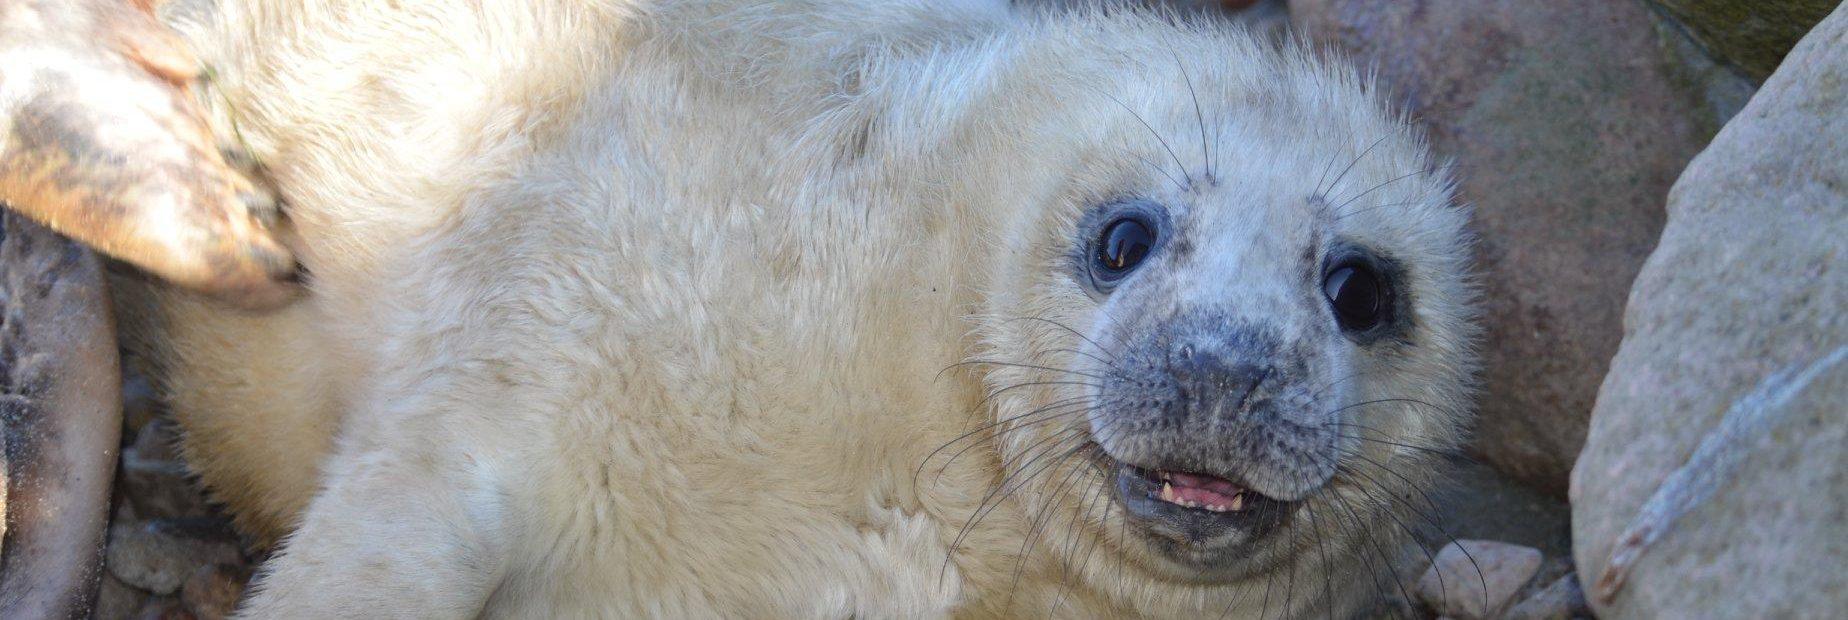 Seal Aquarium – the marine station in Hel